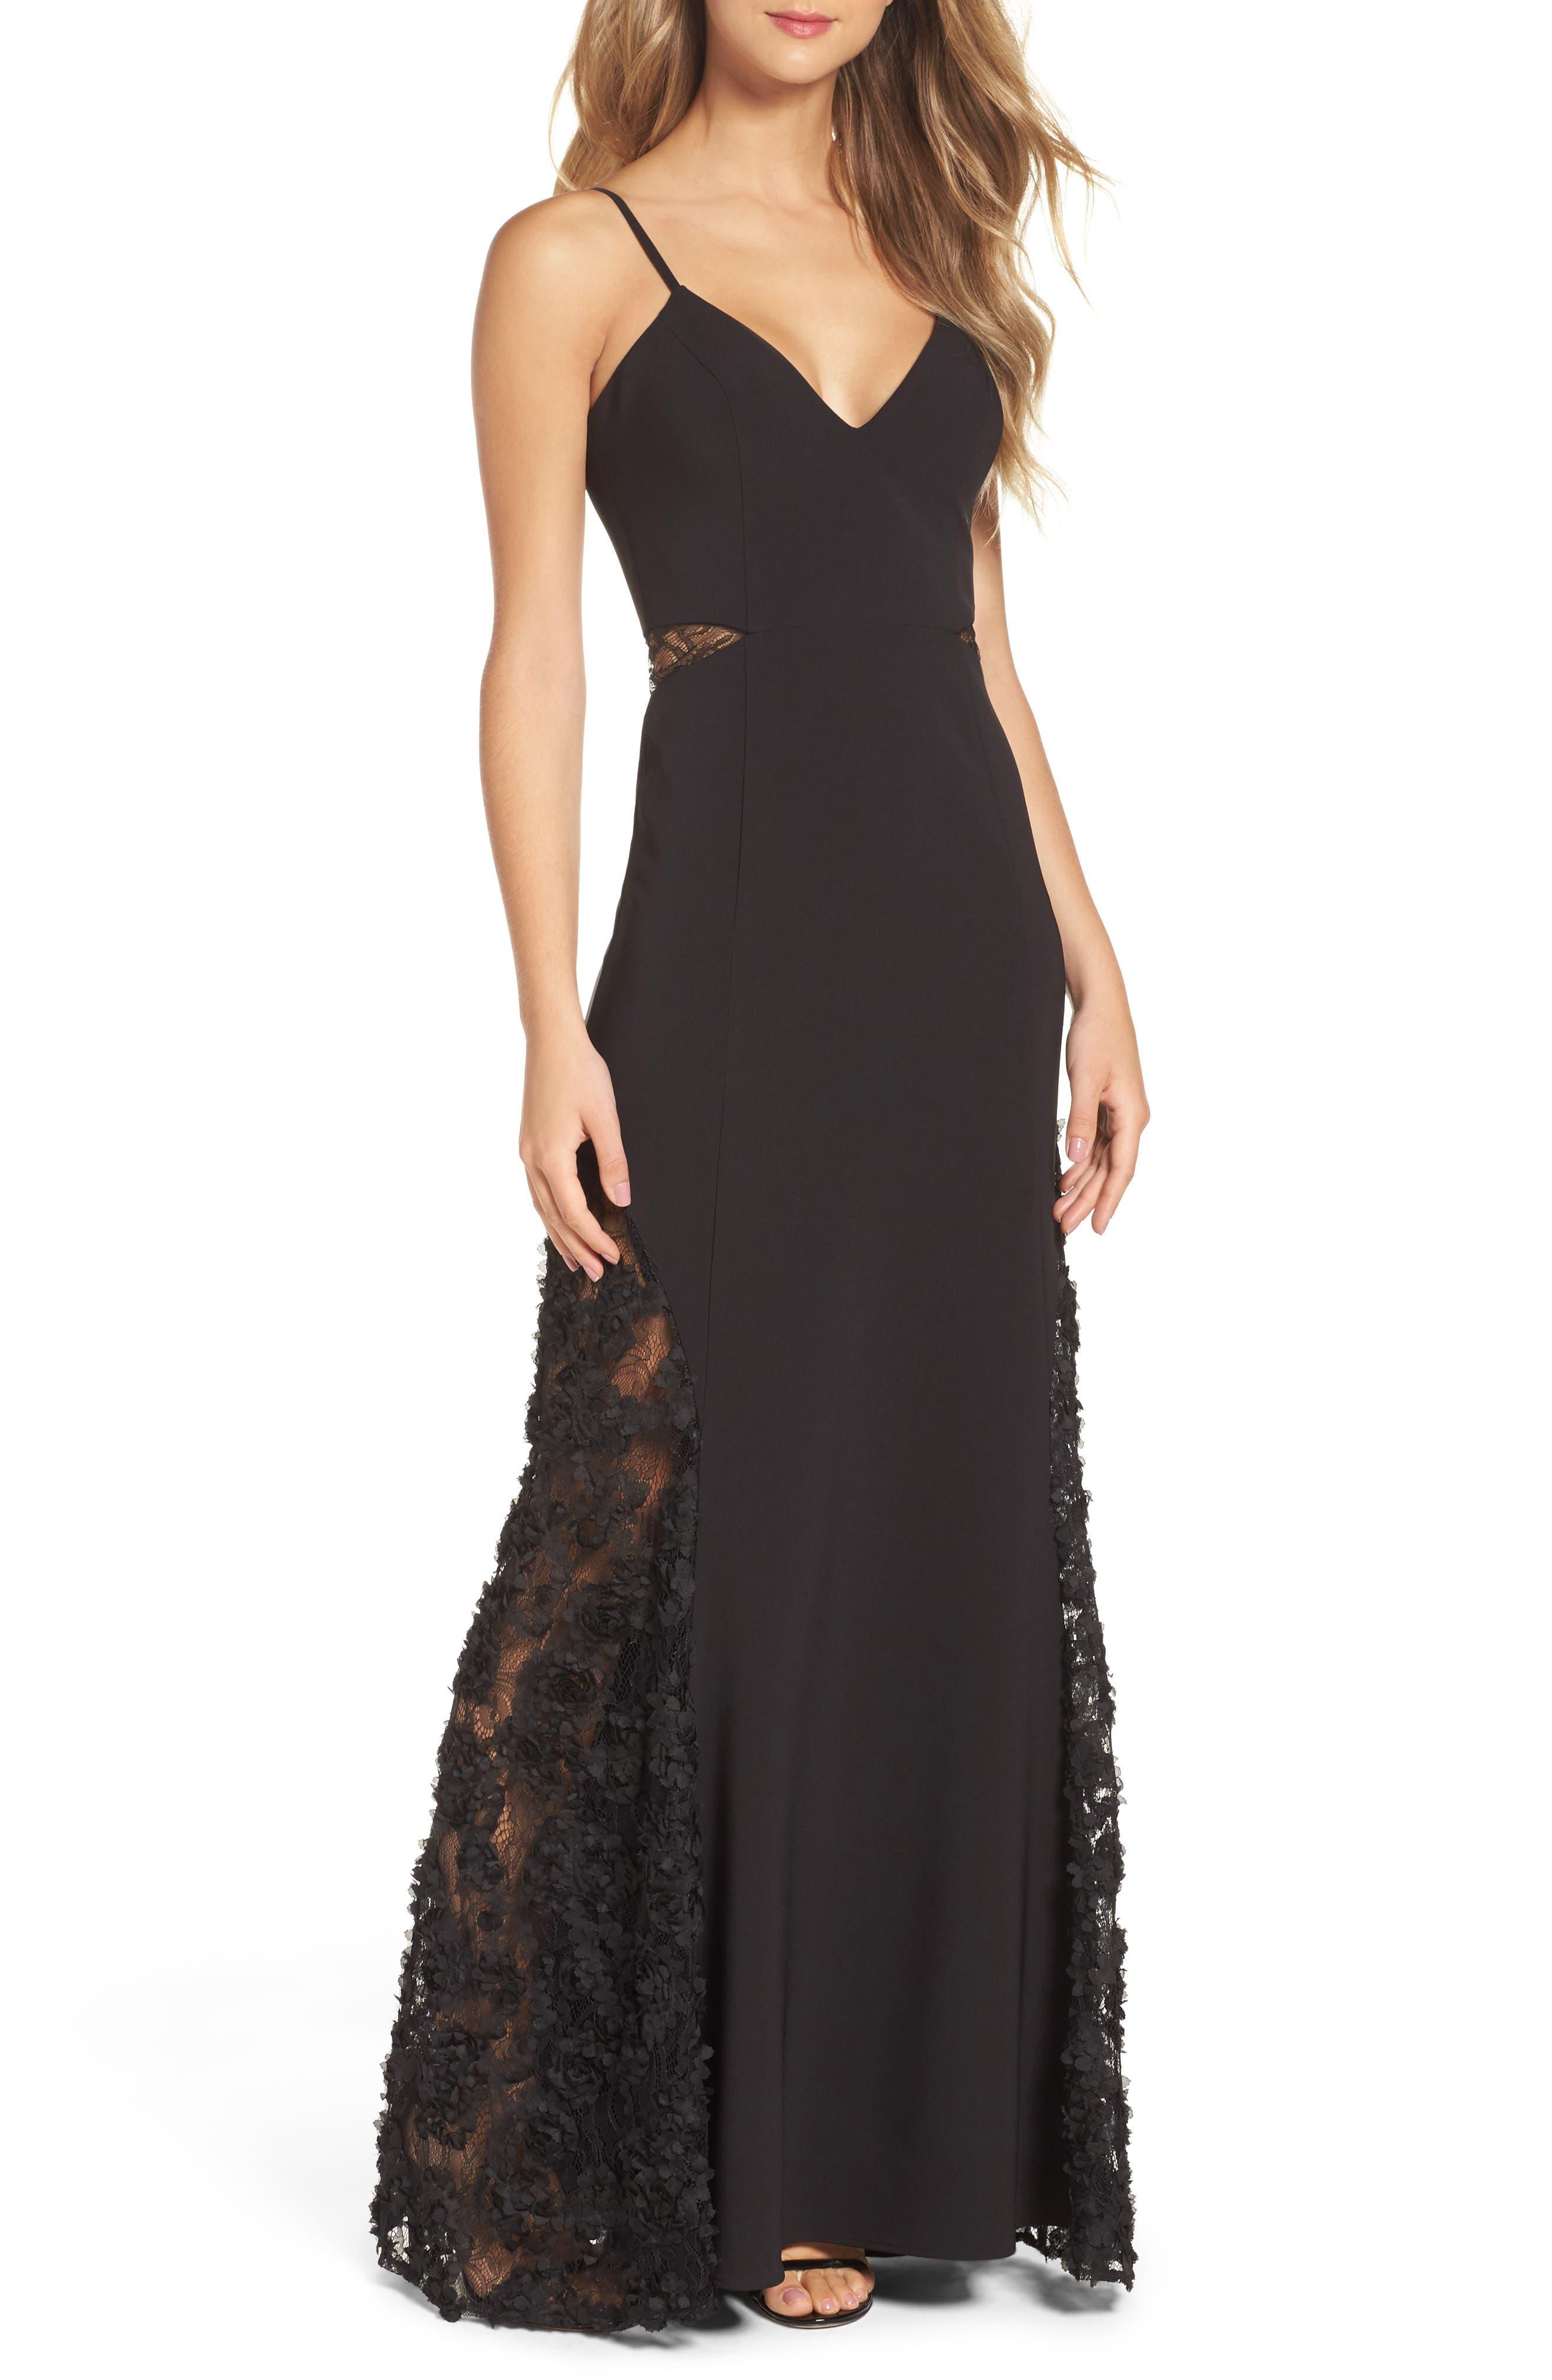 Shannon Lace Inset Gown,                             Main thumbnail 1, color,                             Black